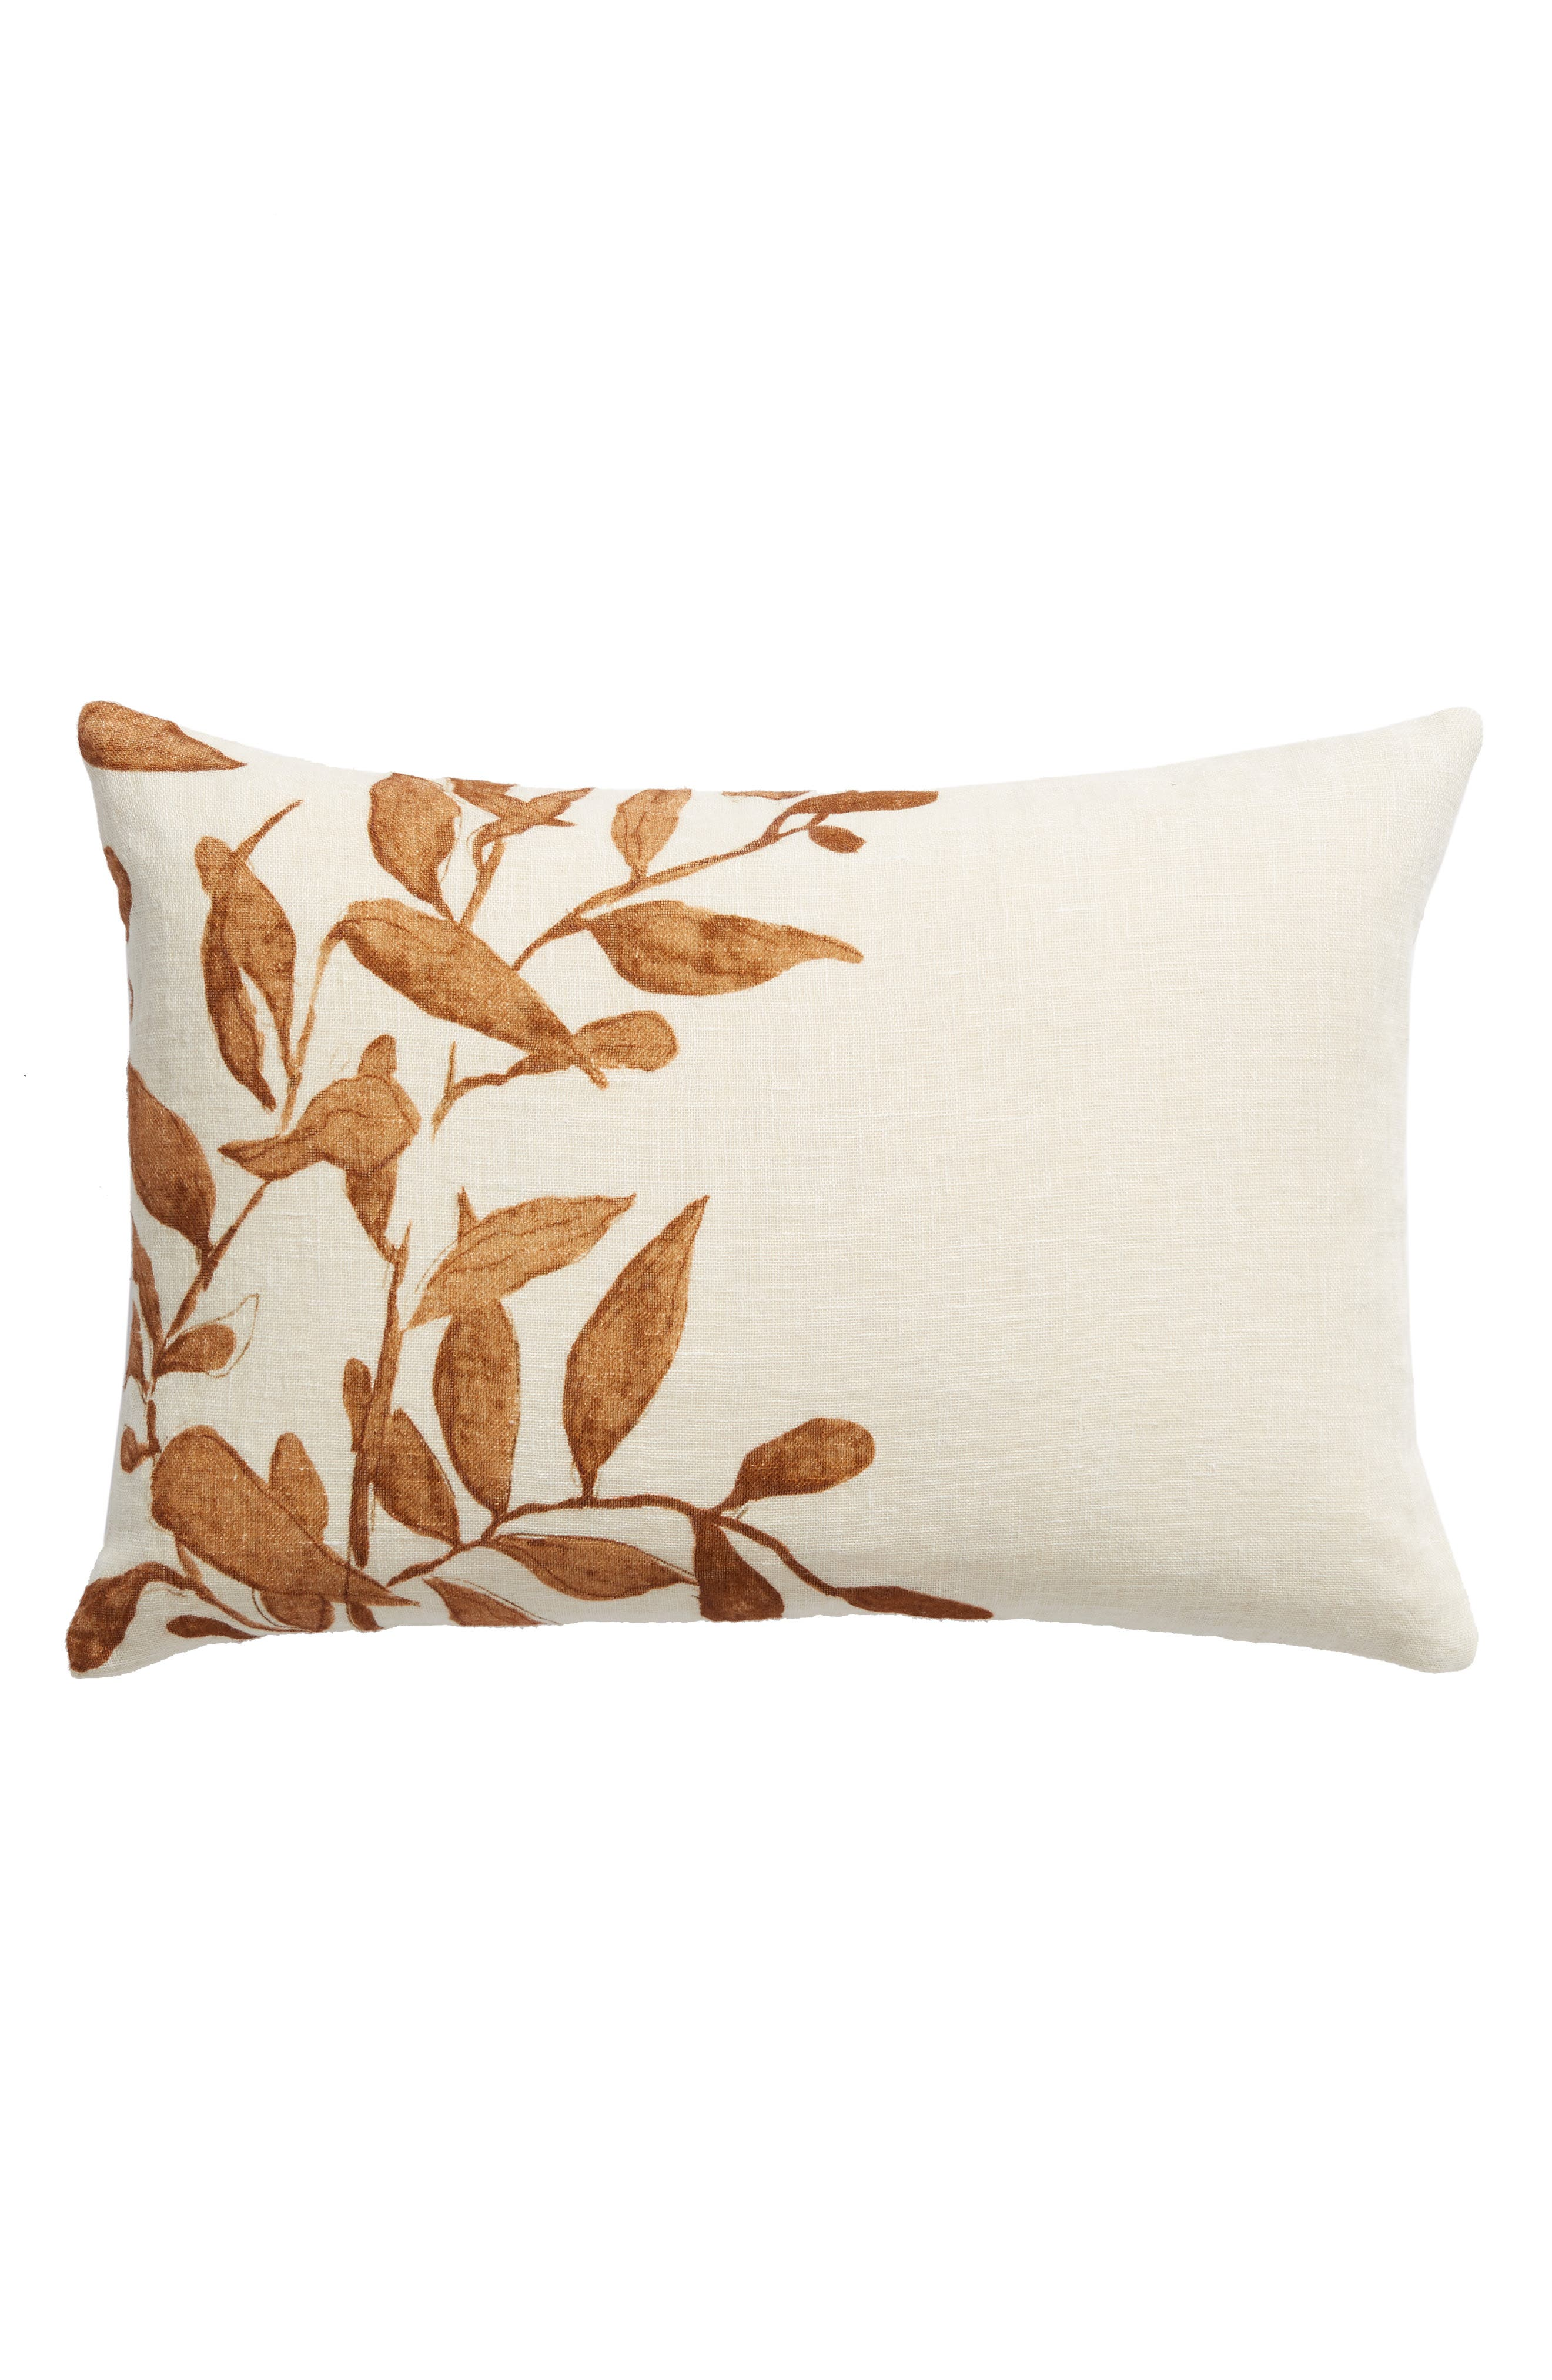 TREASURE & BOND, Vine Accent Pillow, Main thumbnail 1, color, BROWN RUSTIC MULTI